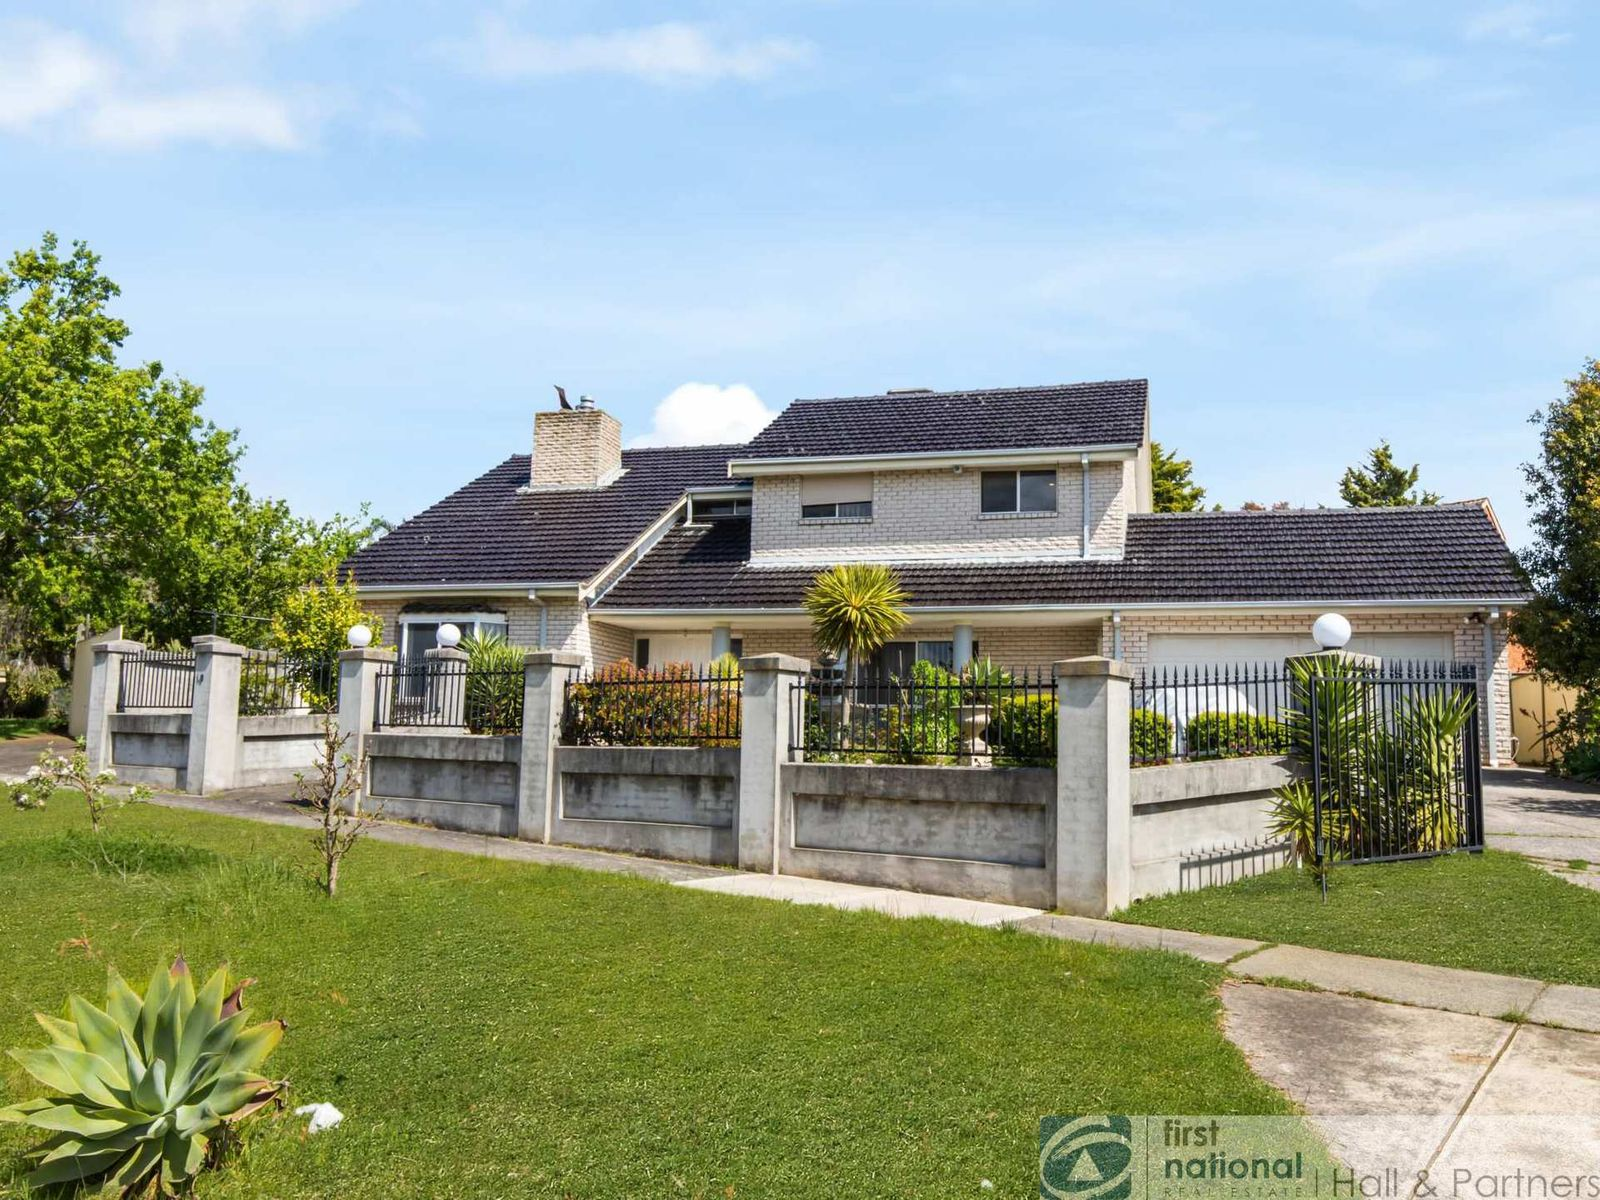 10 Kassan Gardens, Endeavour Hills, VIC 3802